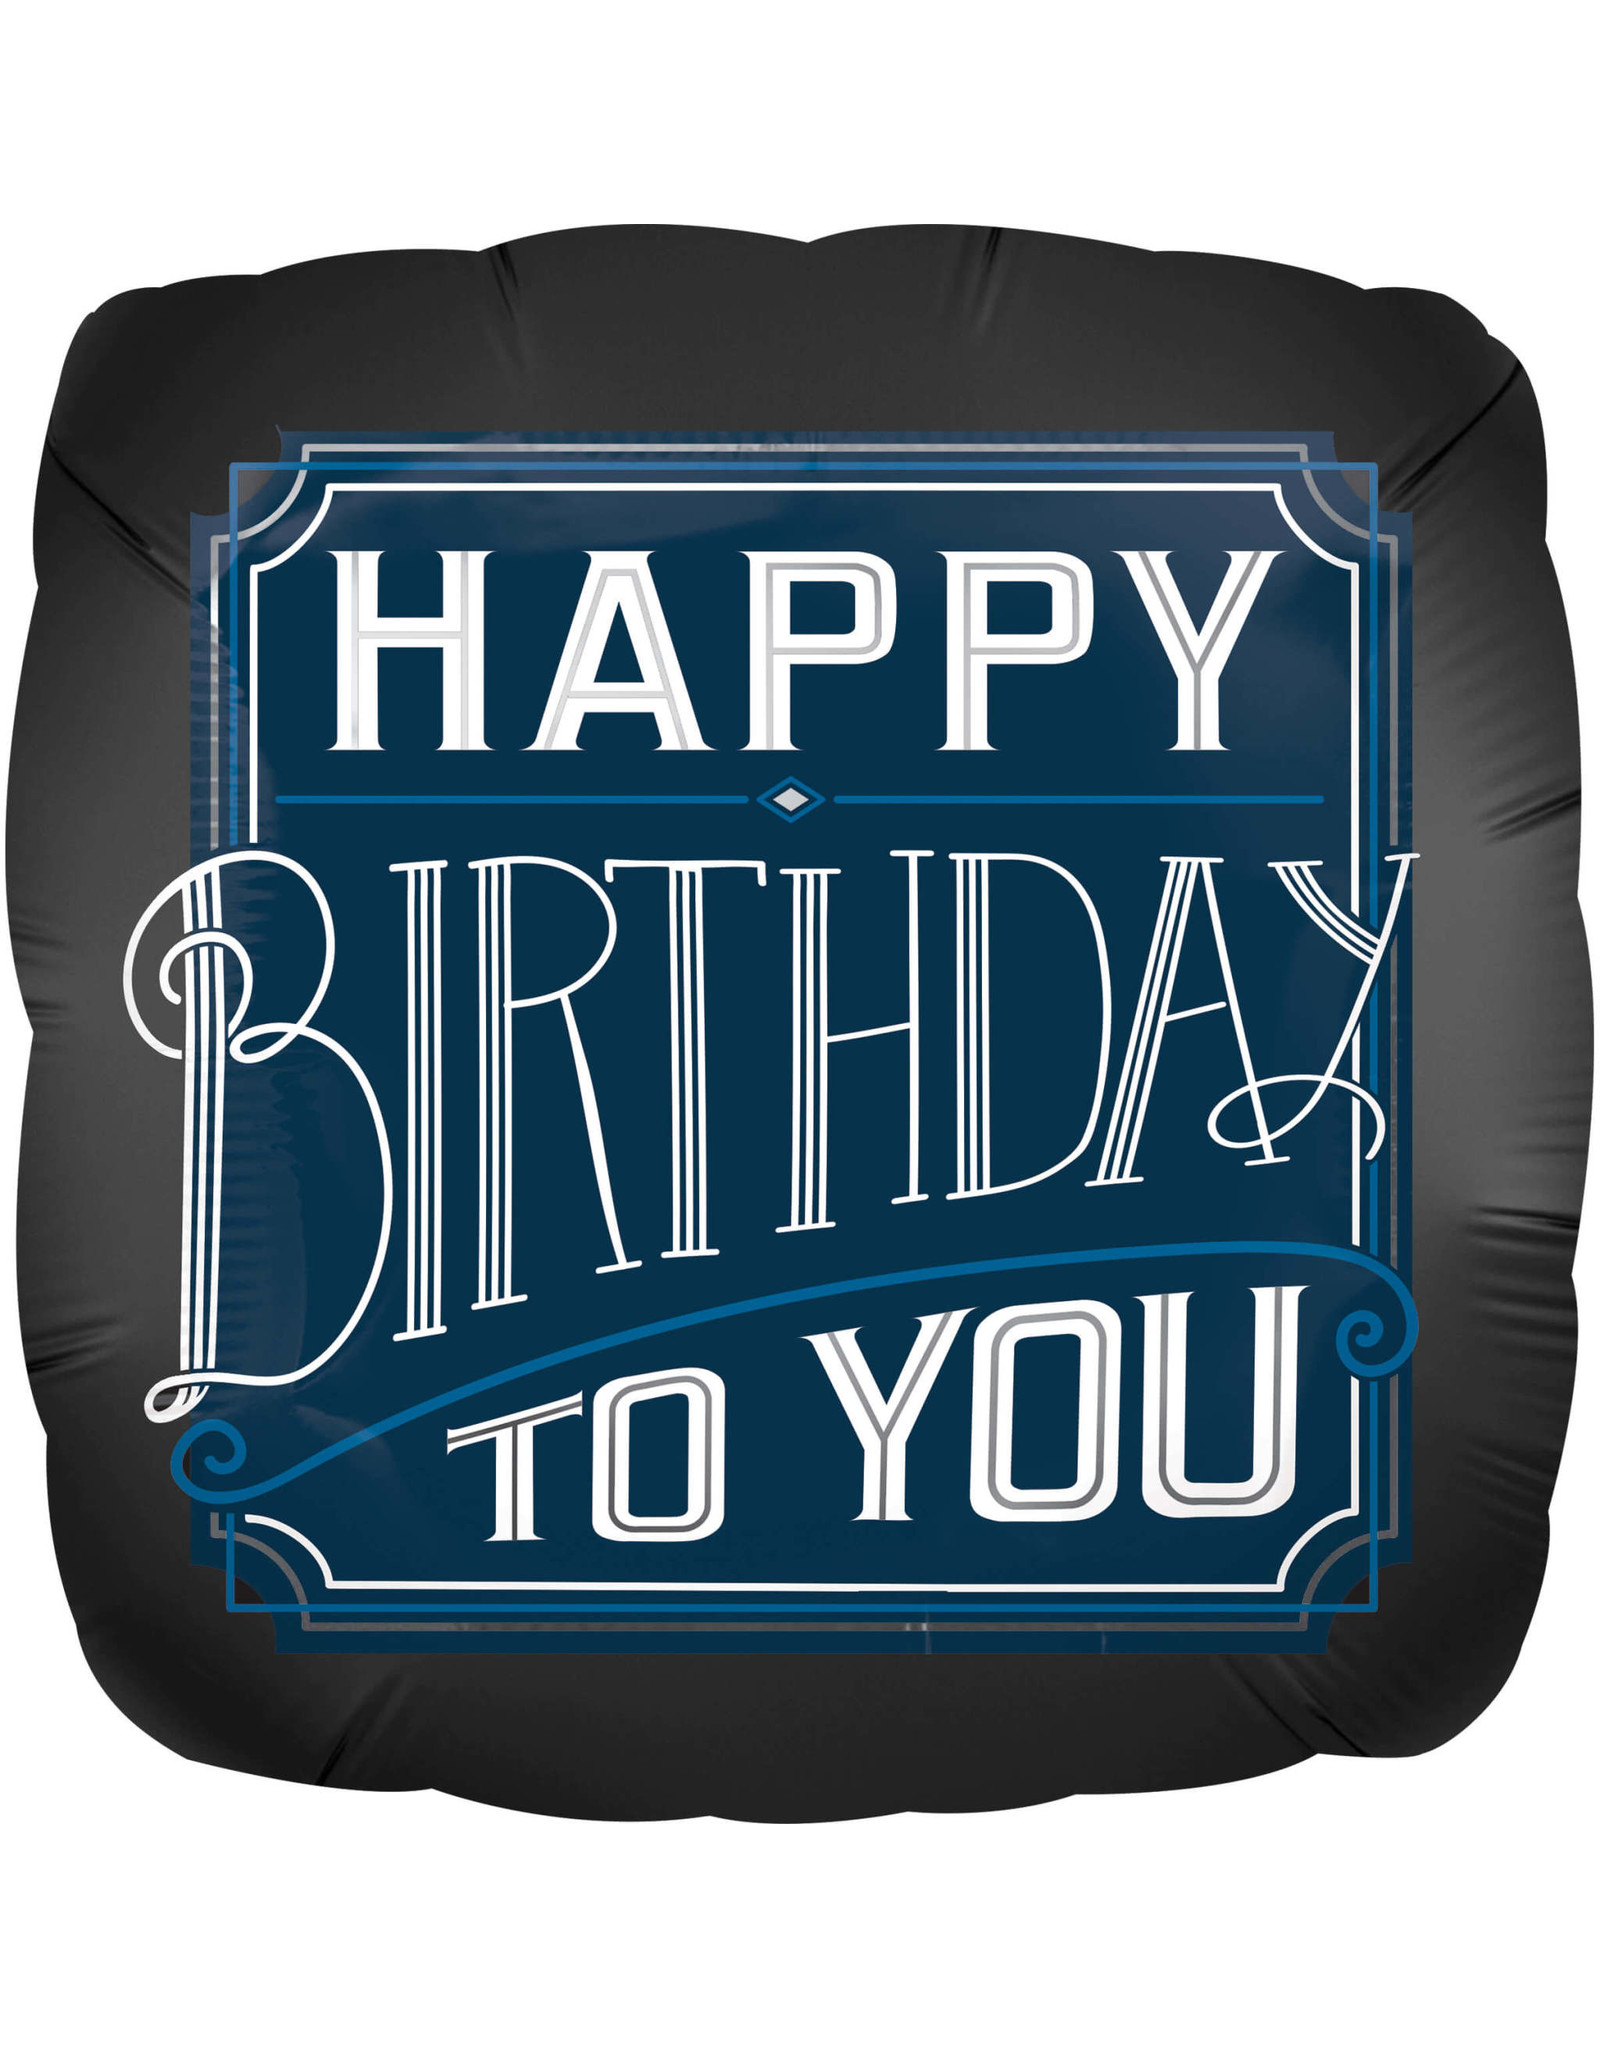 Amscan folieballon supershape happy birthday to you D blauw 71 cm